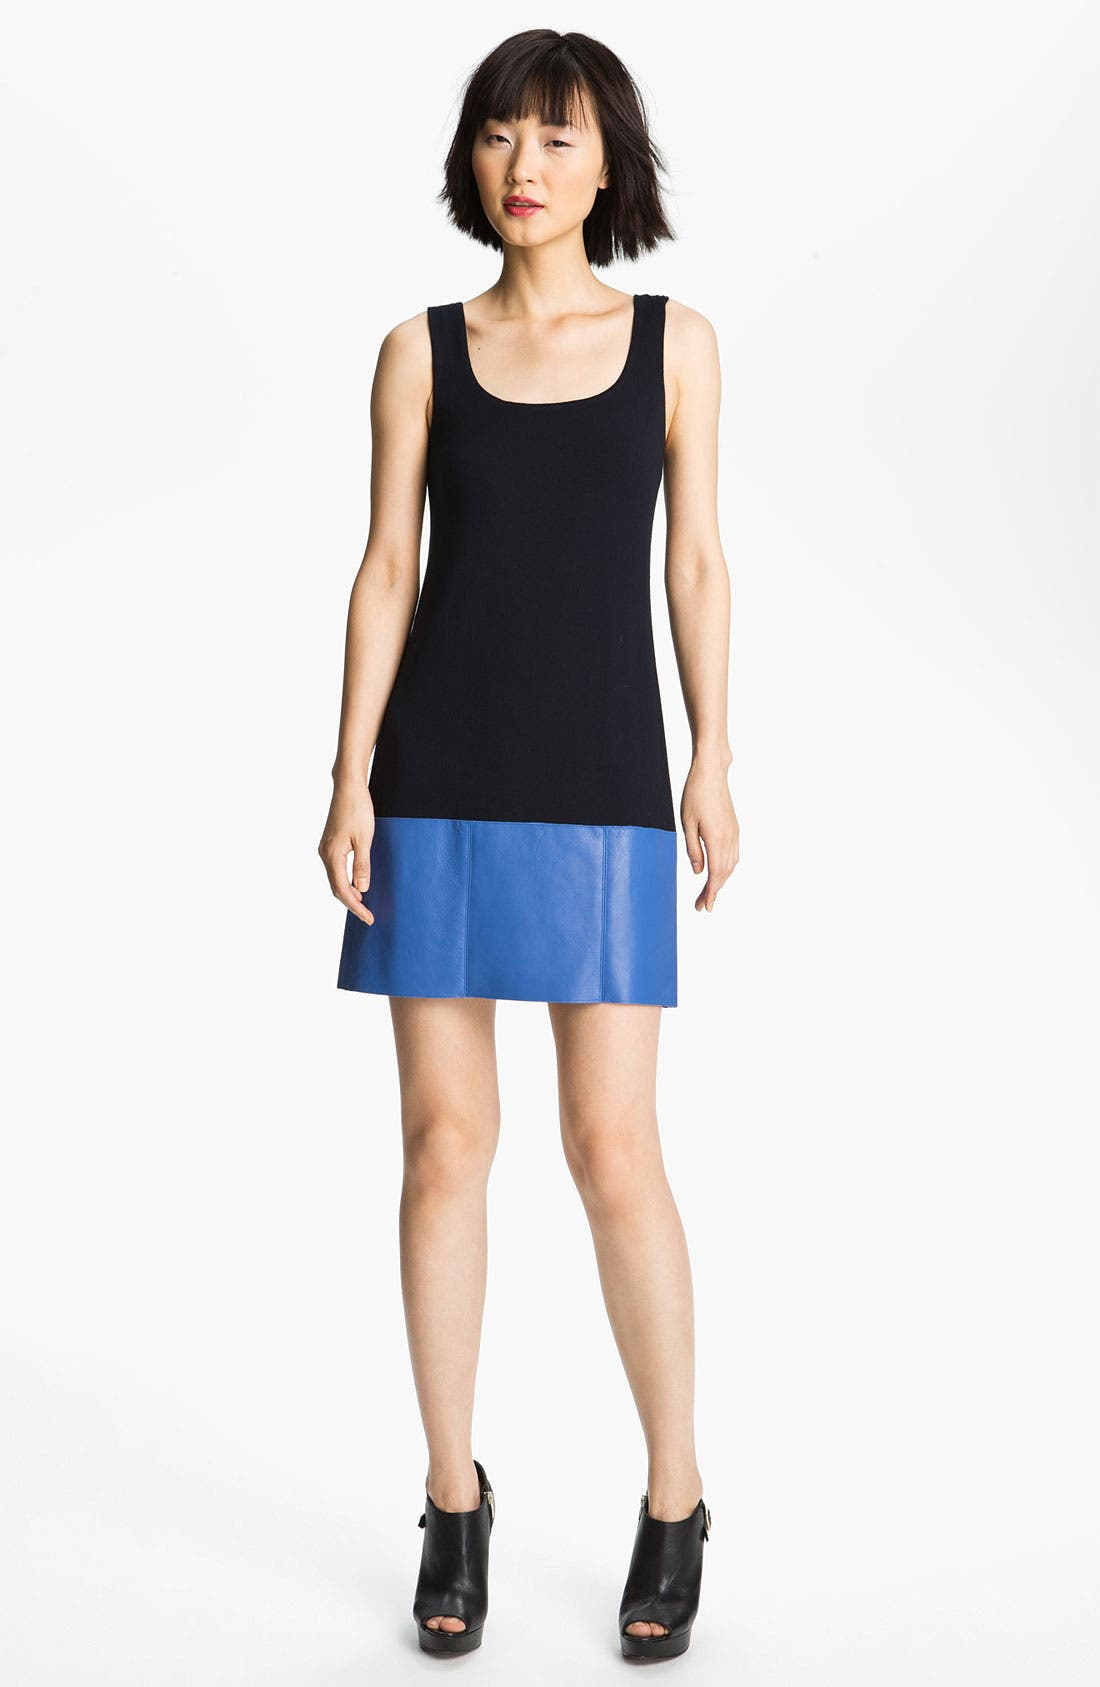 Main Image - B44 Dressed by Bailey 44 'Horizon' Colorblock Tank Dress